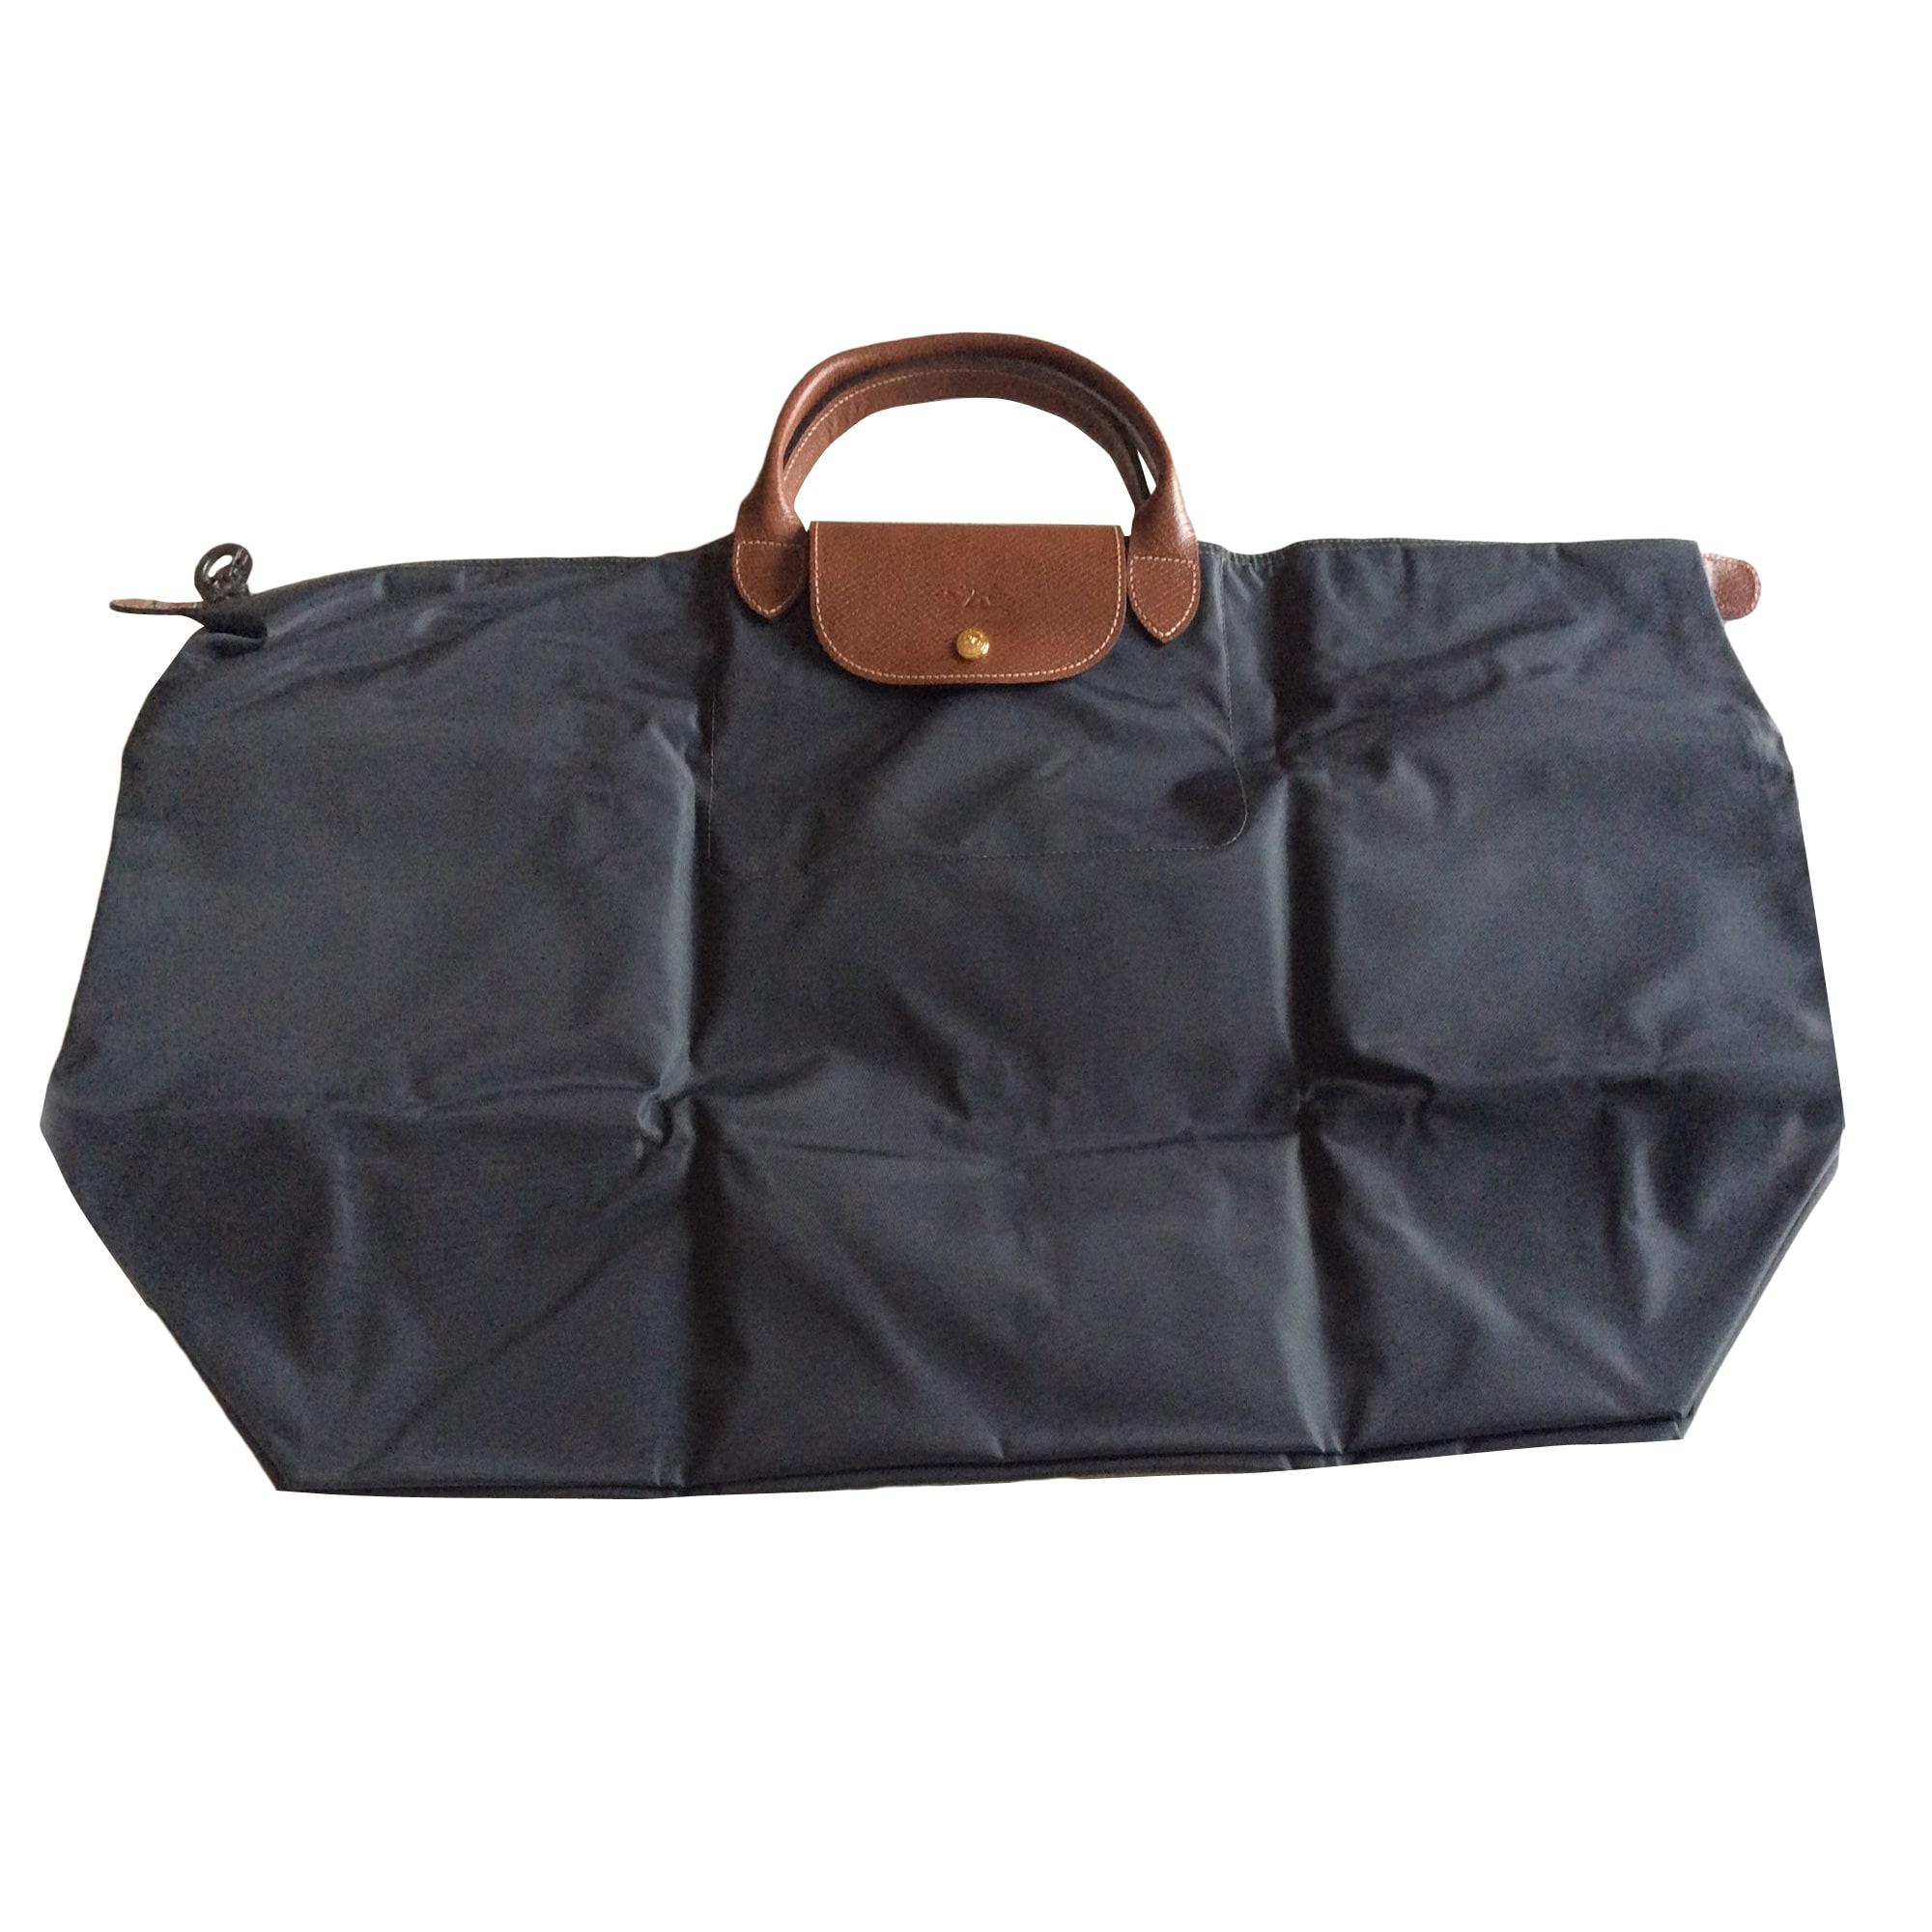 sac de voyage xl longchamp,Free Shipping,OFF77%,in stock!